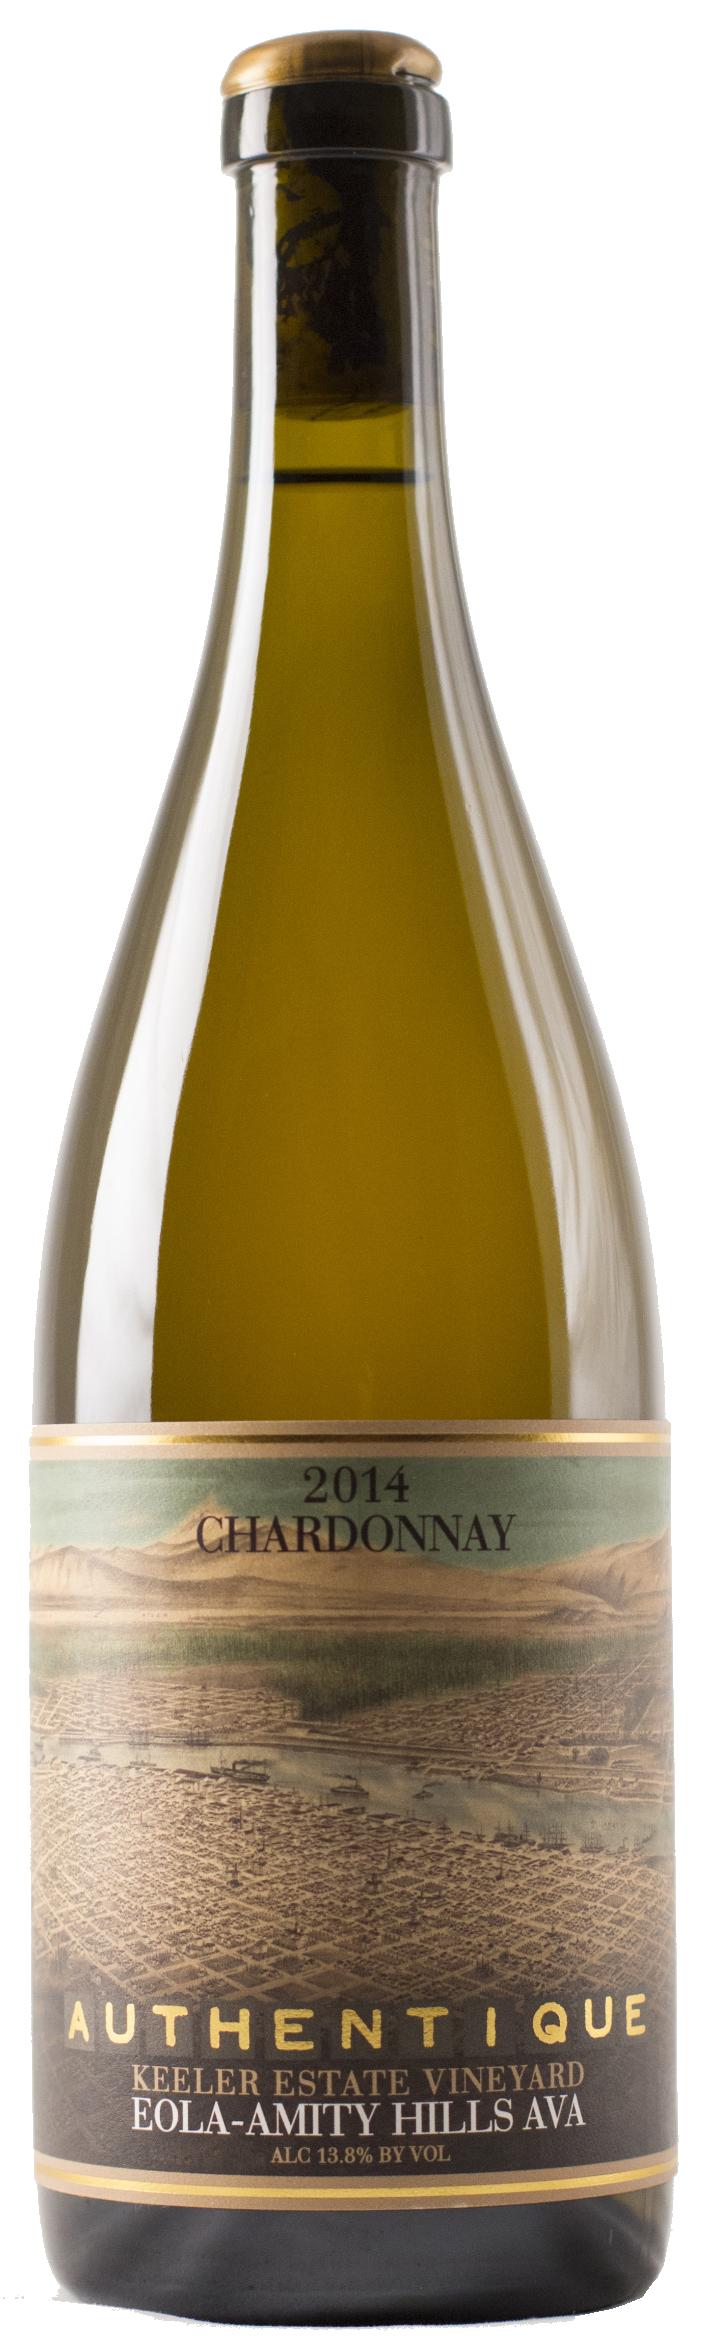 Chardonnay 'Keeler Estate Vineyard'